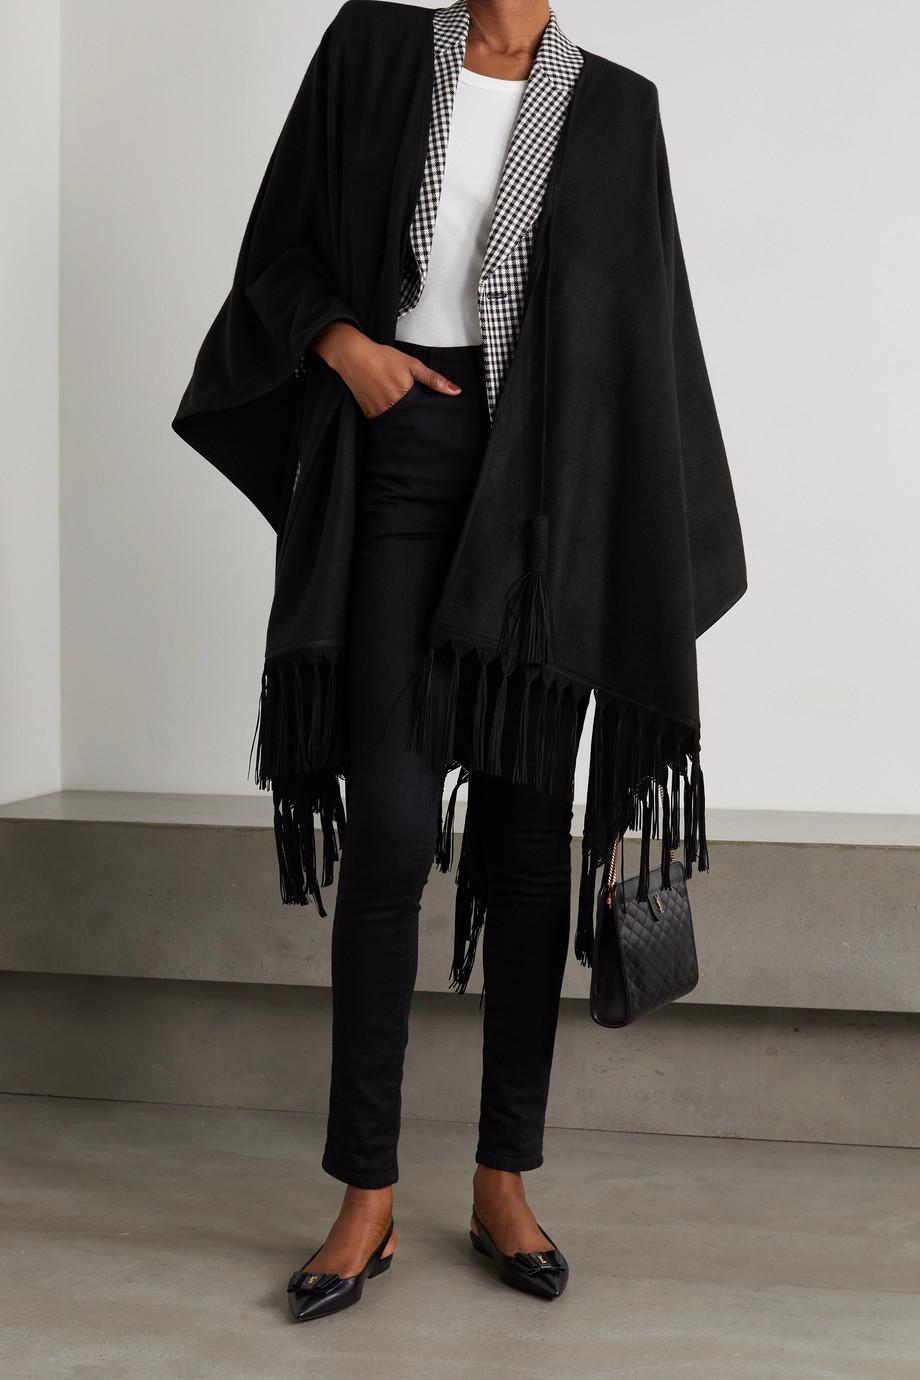 SAINT LAURENT Tasseled suede-trimmed cashmere poncho